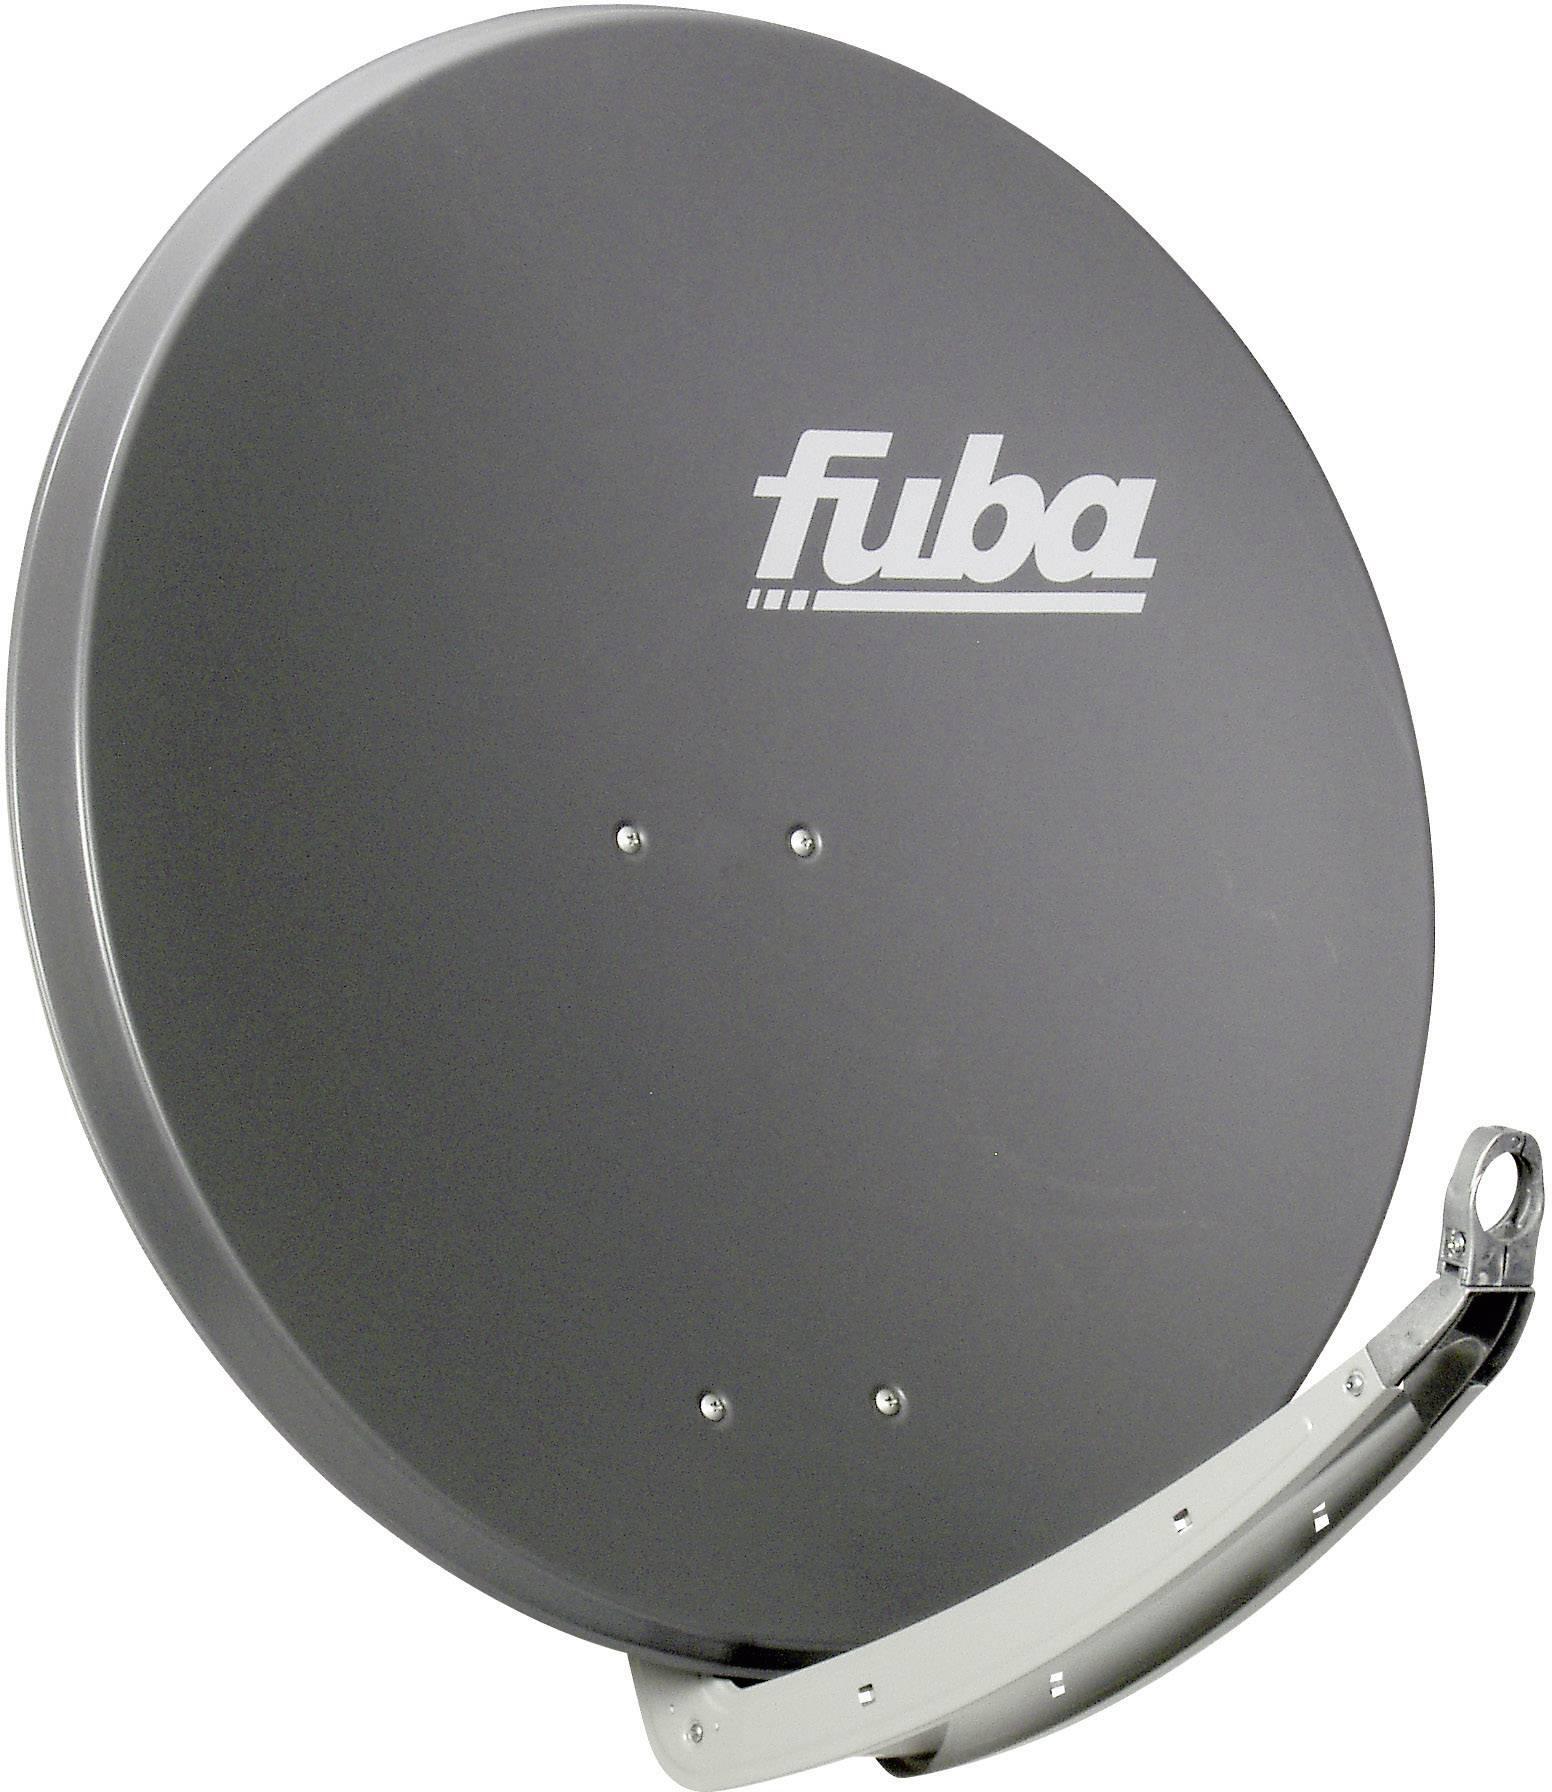 Satelitní anténa, Fuba DAA 850 A, 85 cm, tmavě šedá